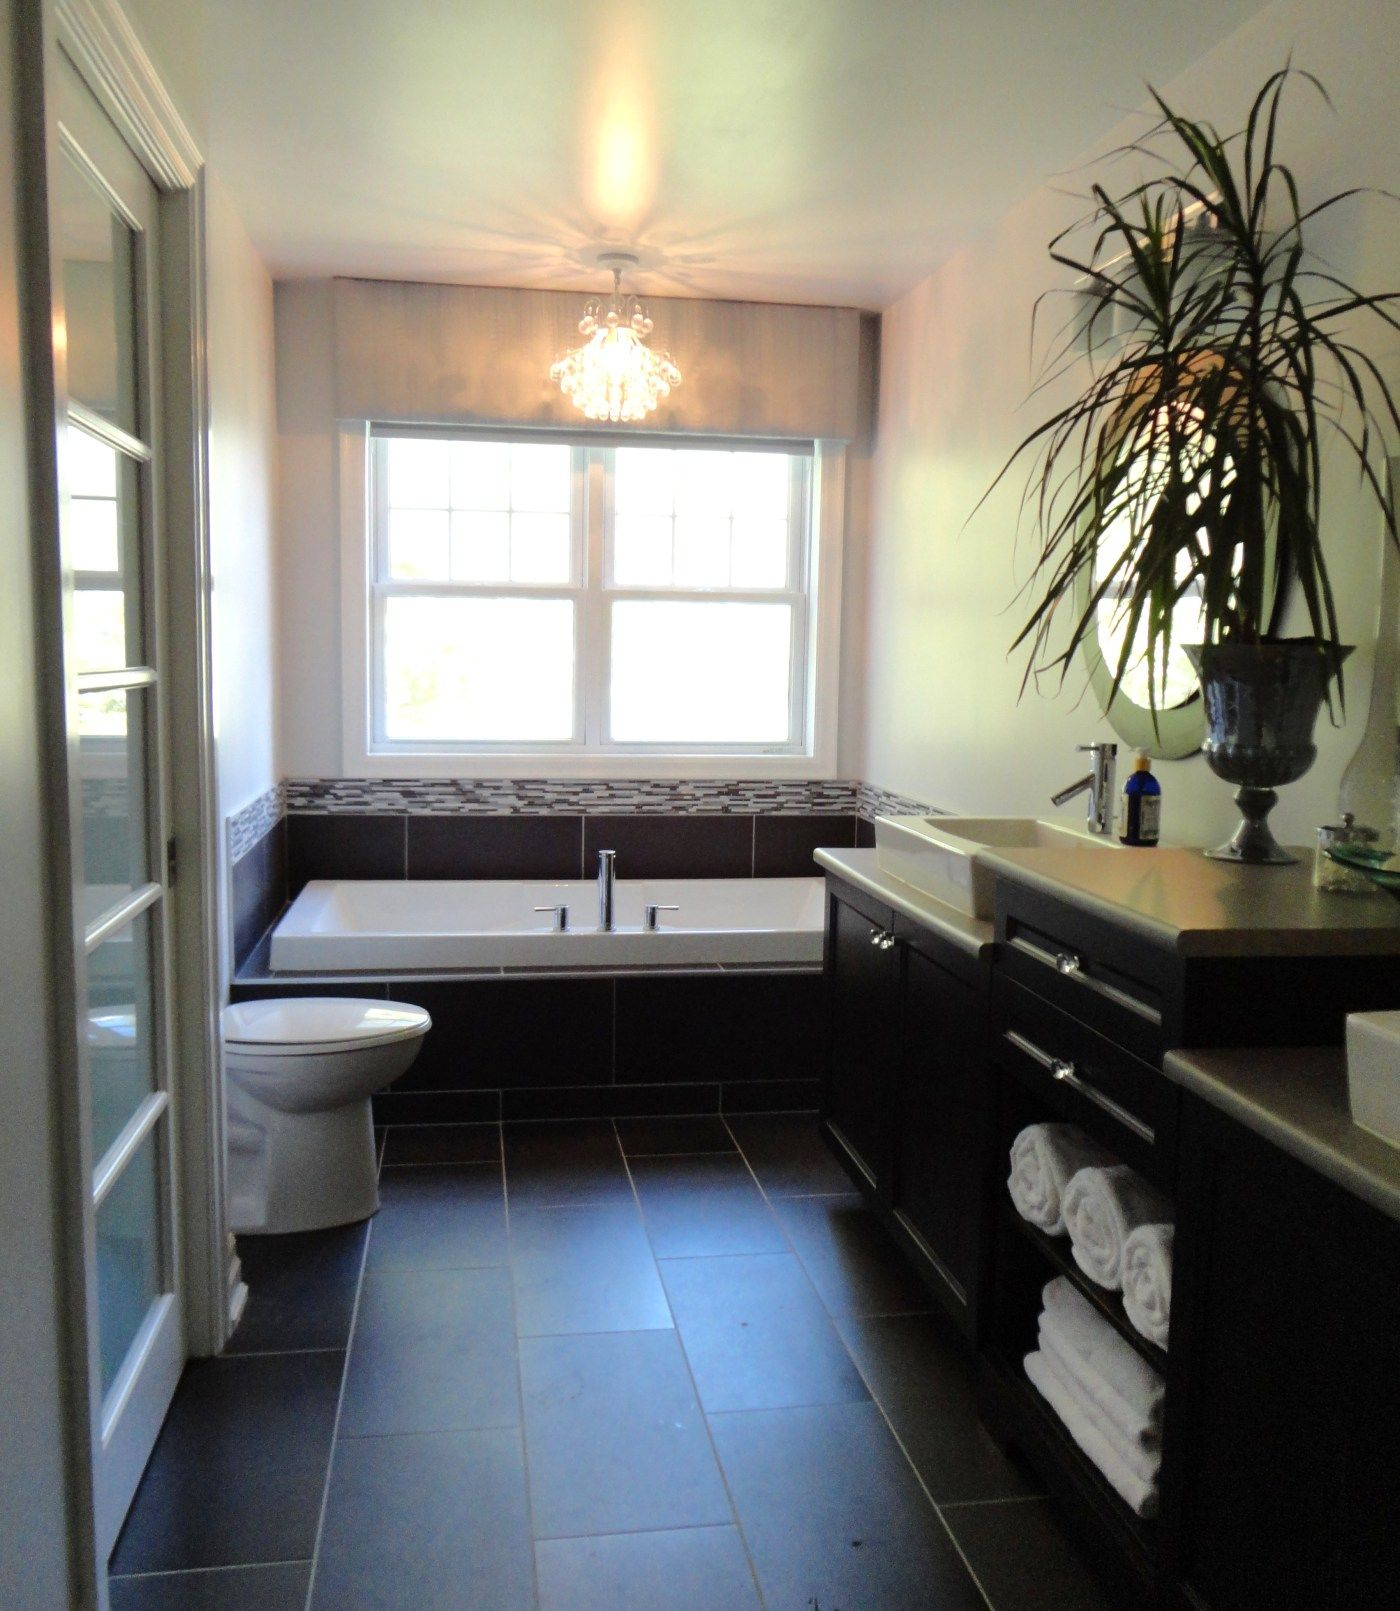 Bathroom La Spezia Master Bedroom Design With Balcony Bathroom Styles  Bedroom Design With Balcony